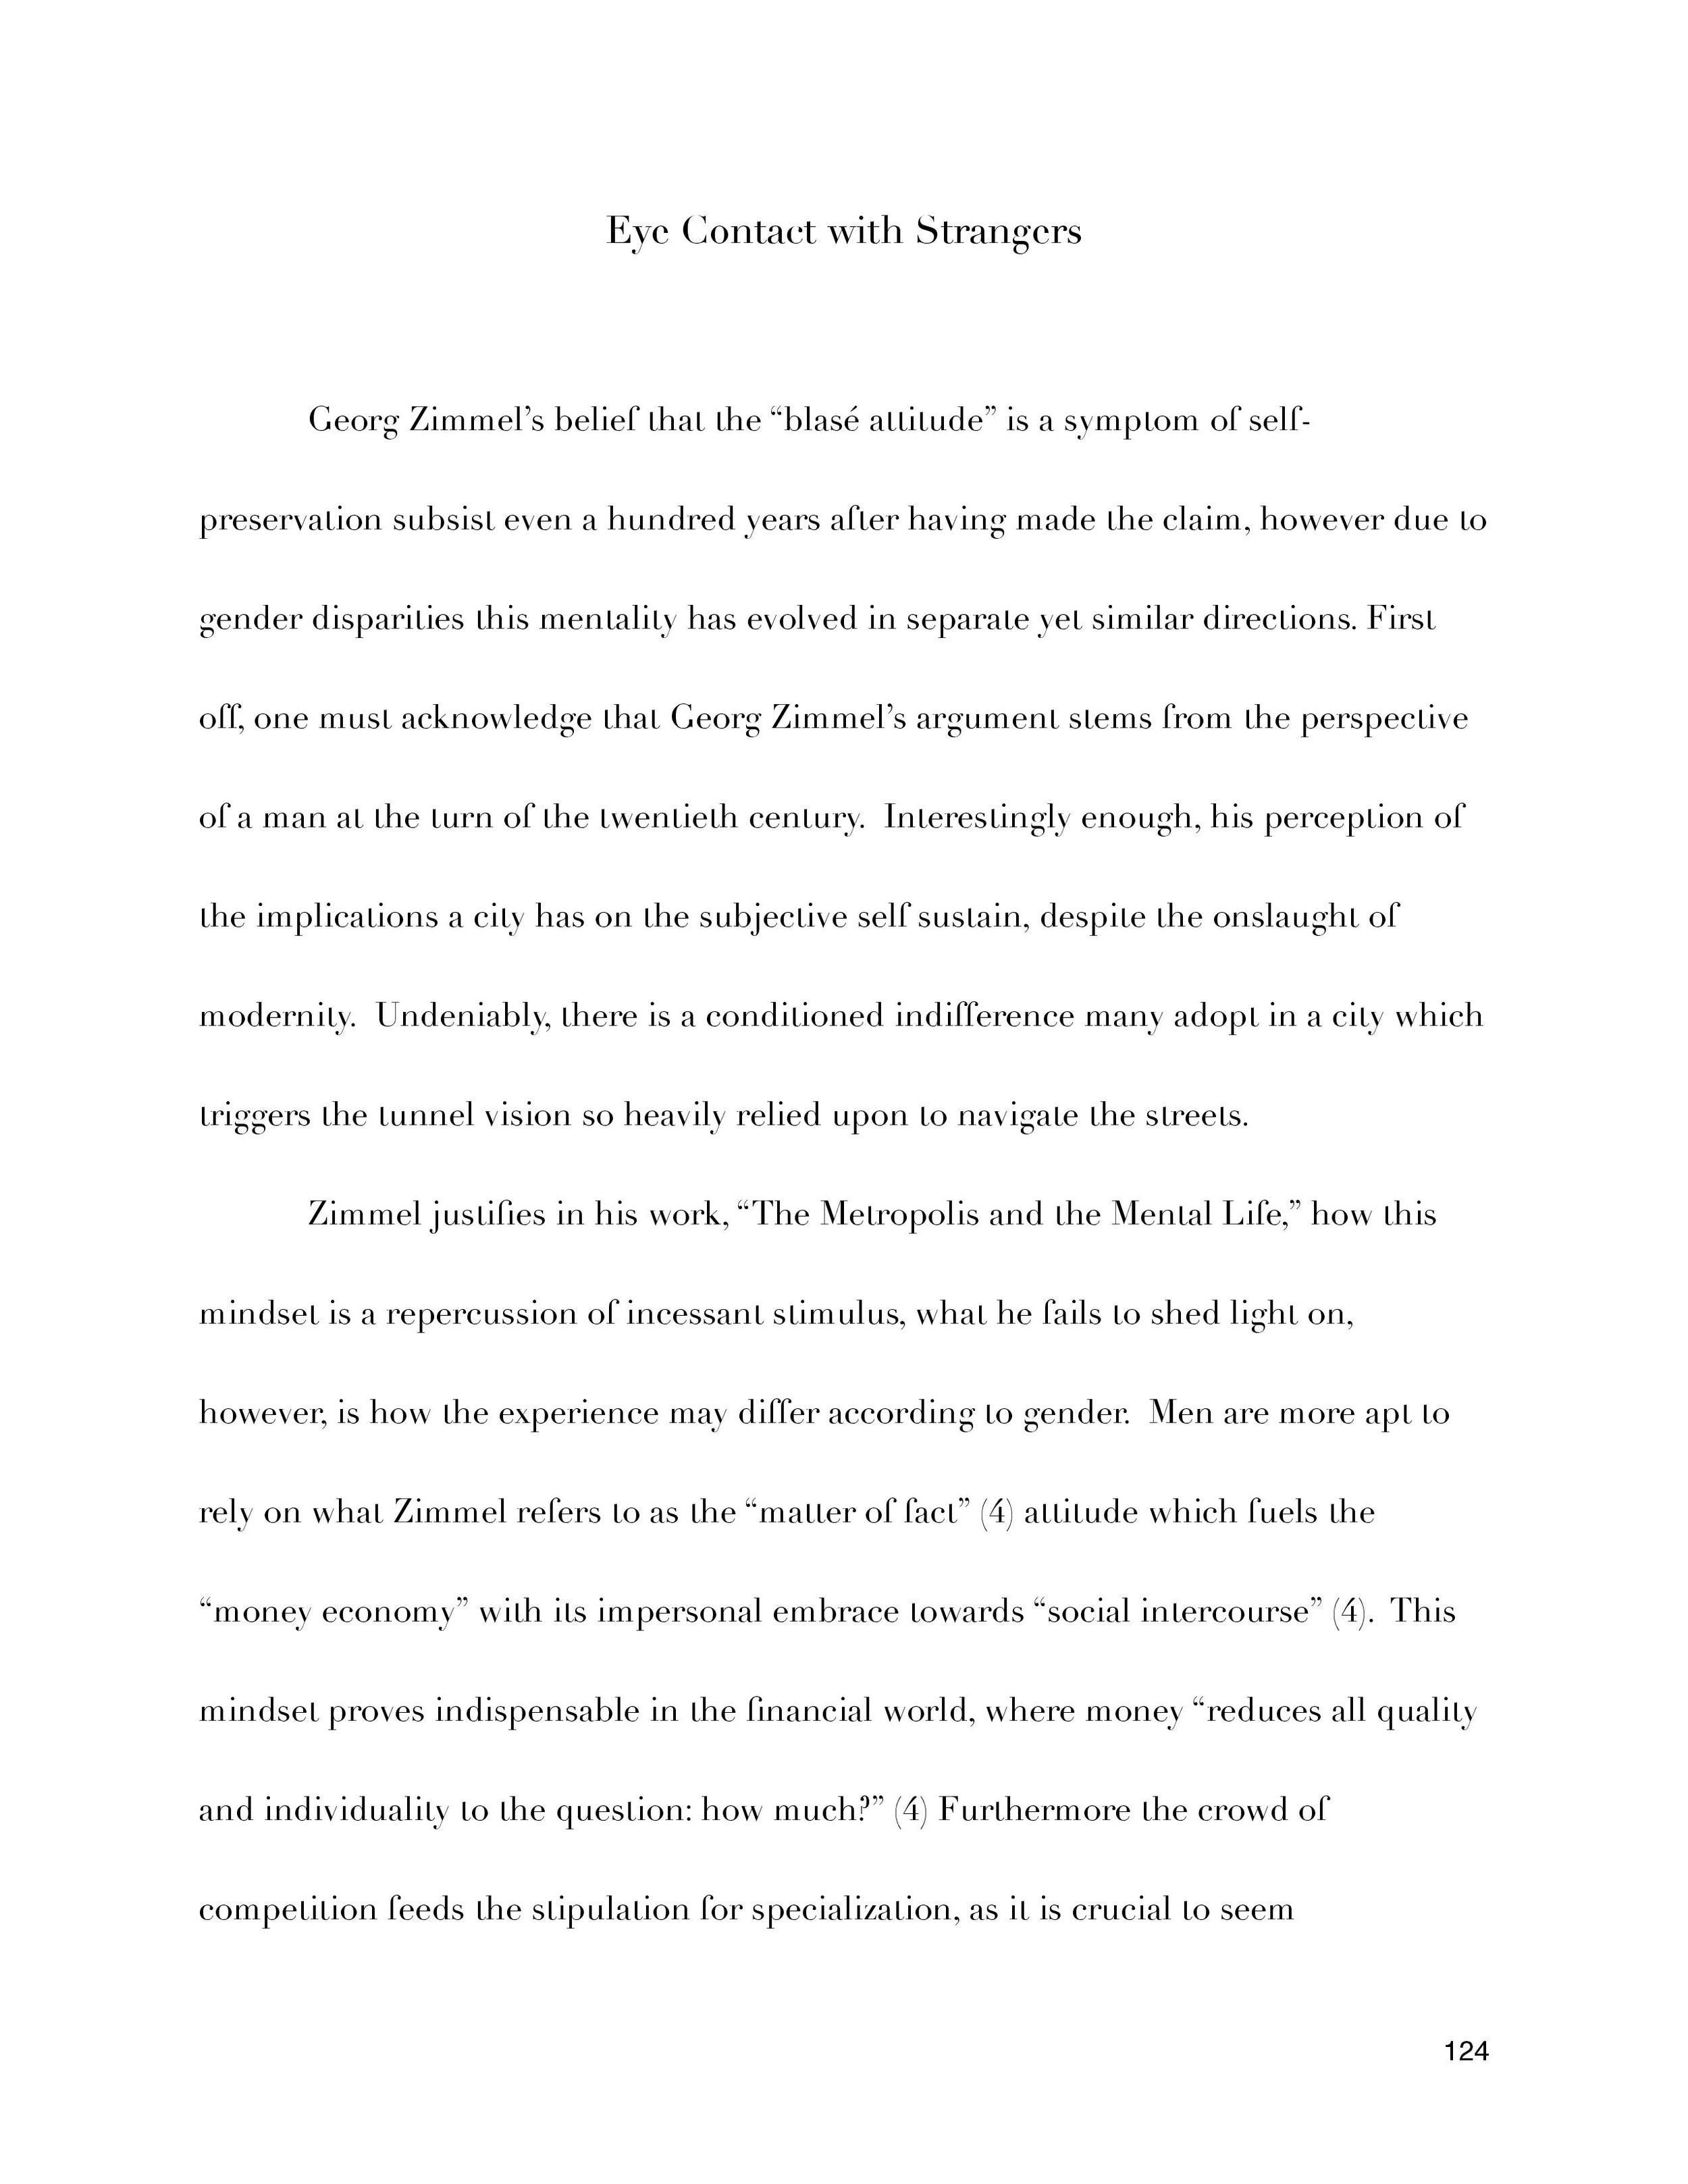 ShatteredGlass-page-125.jpg